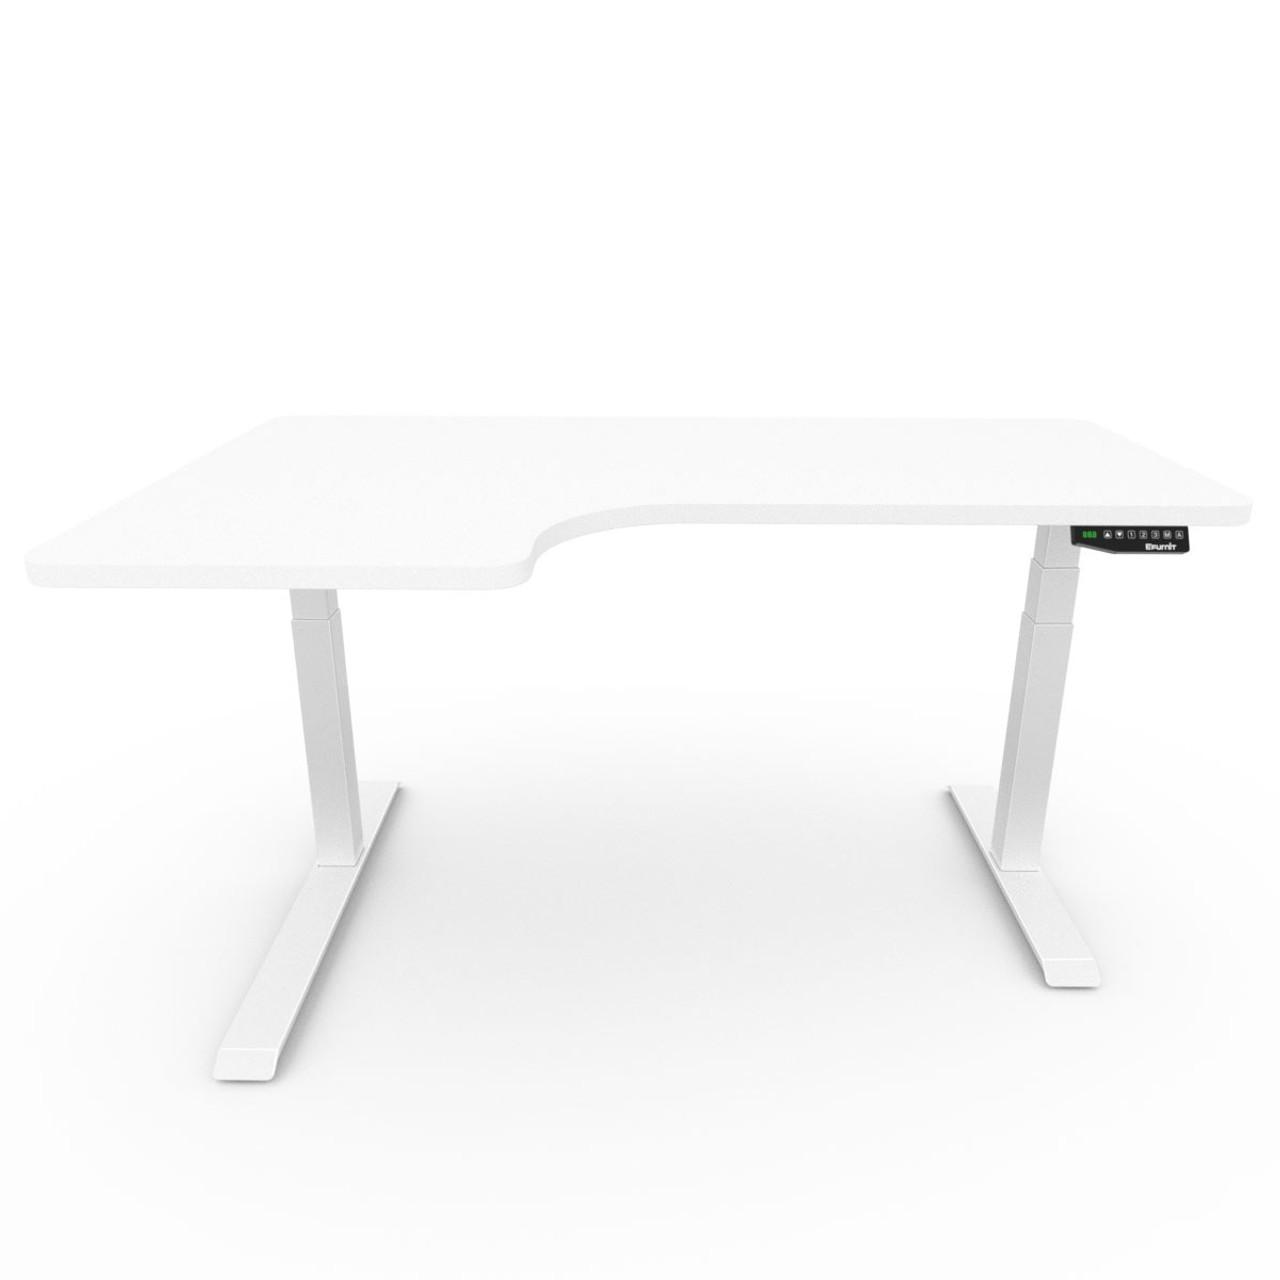 EFurnit Alpine Standing Corner Desk- Home office Ergonomic Height adjustable Electric Sit/Stand desk, Dual motor,White top ,white  frame, smart